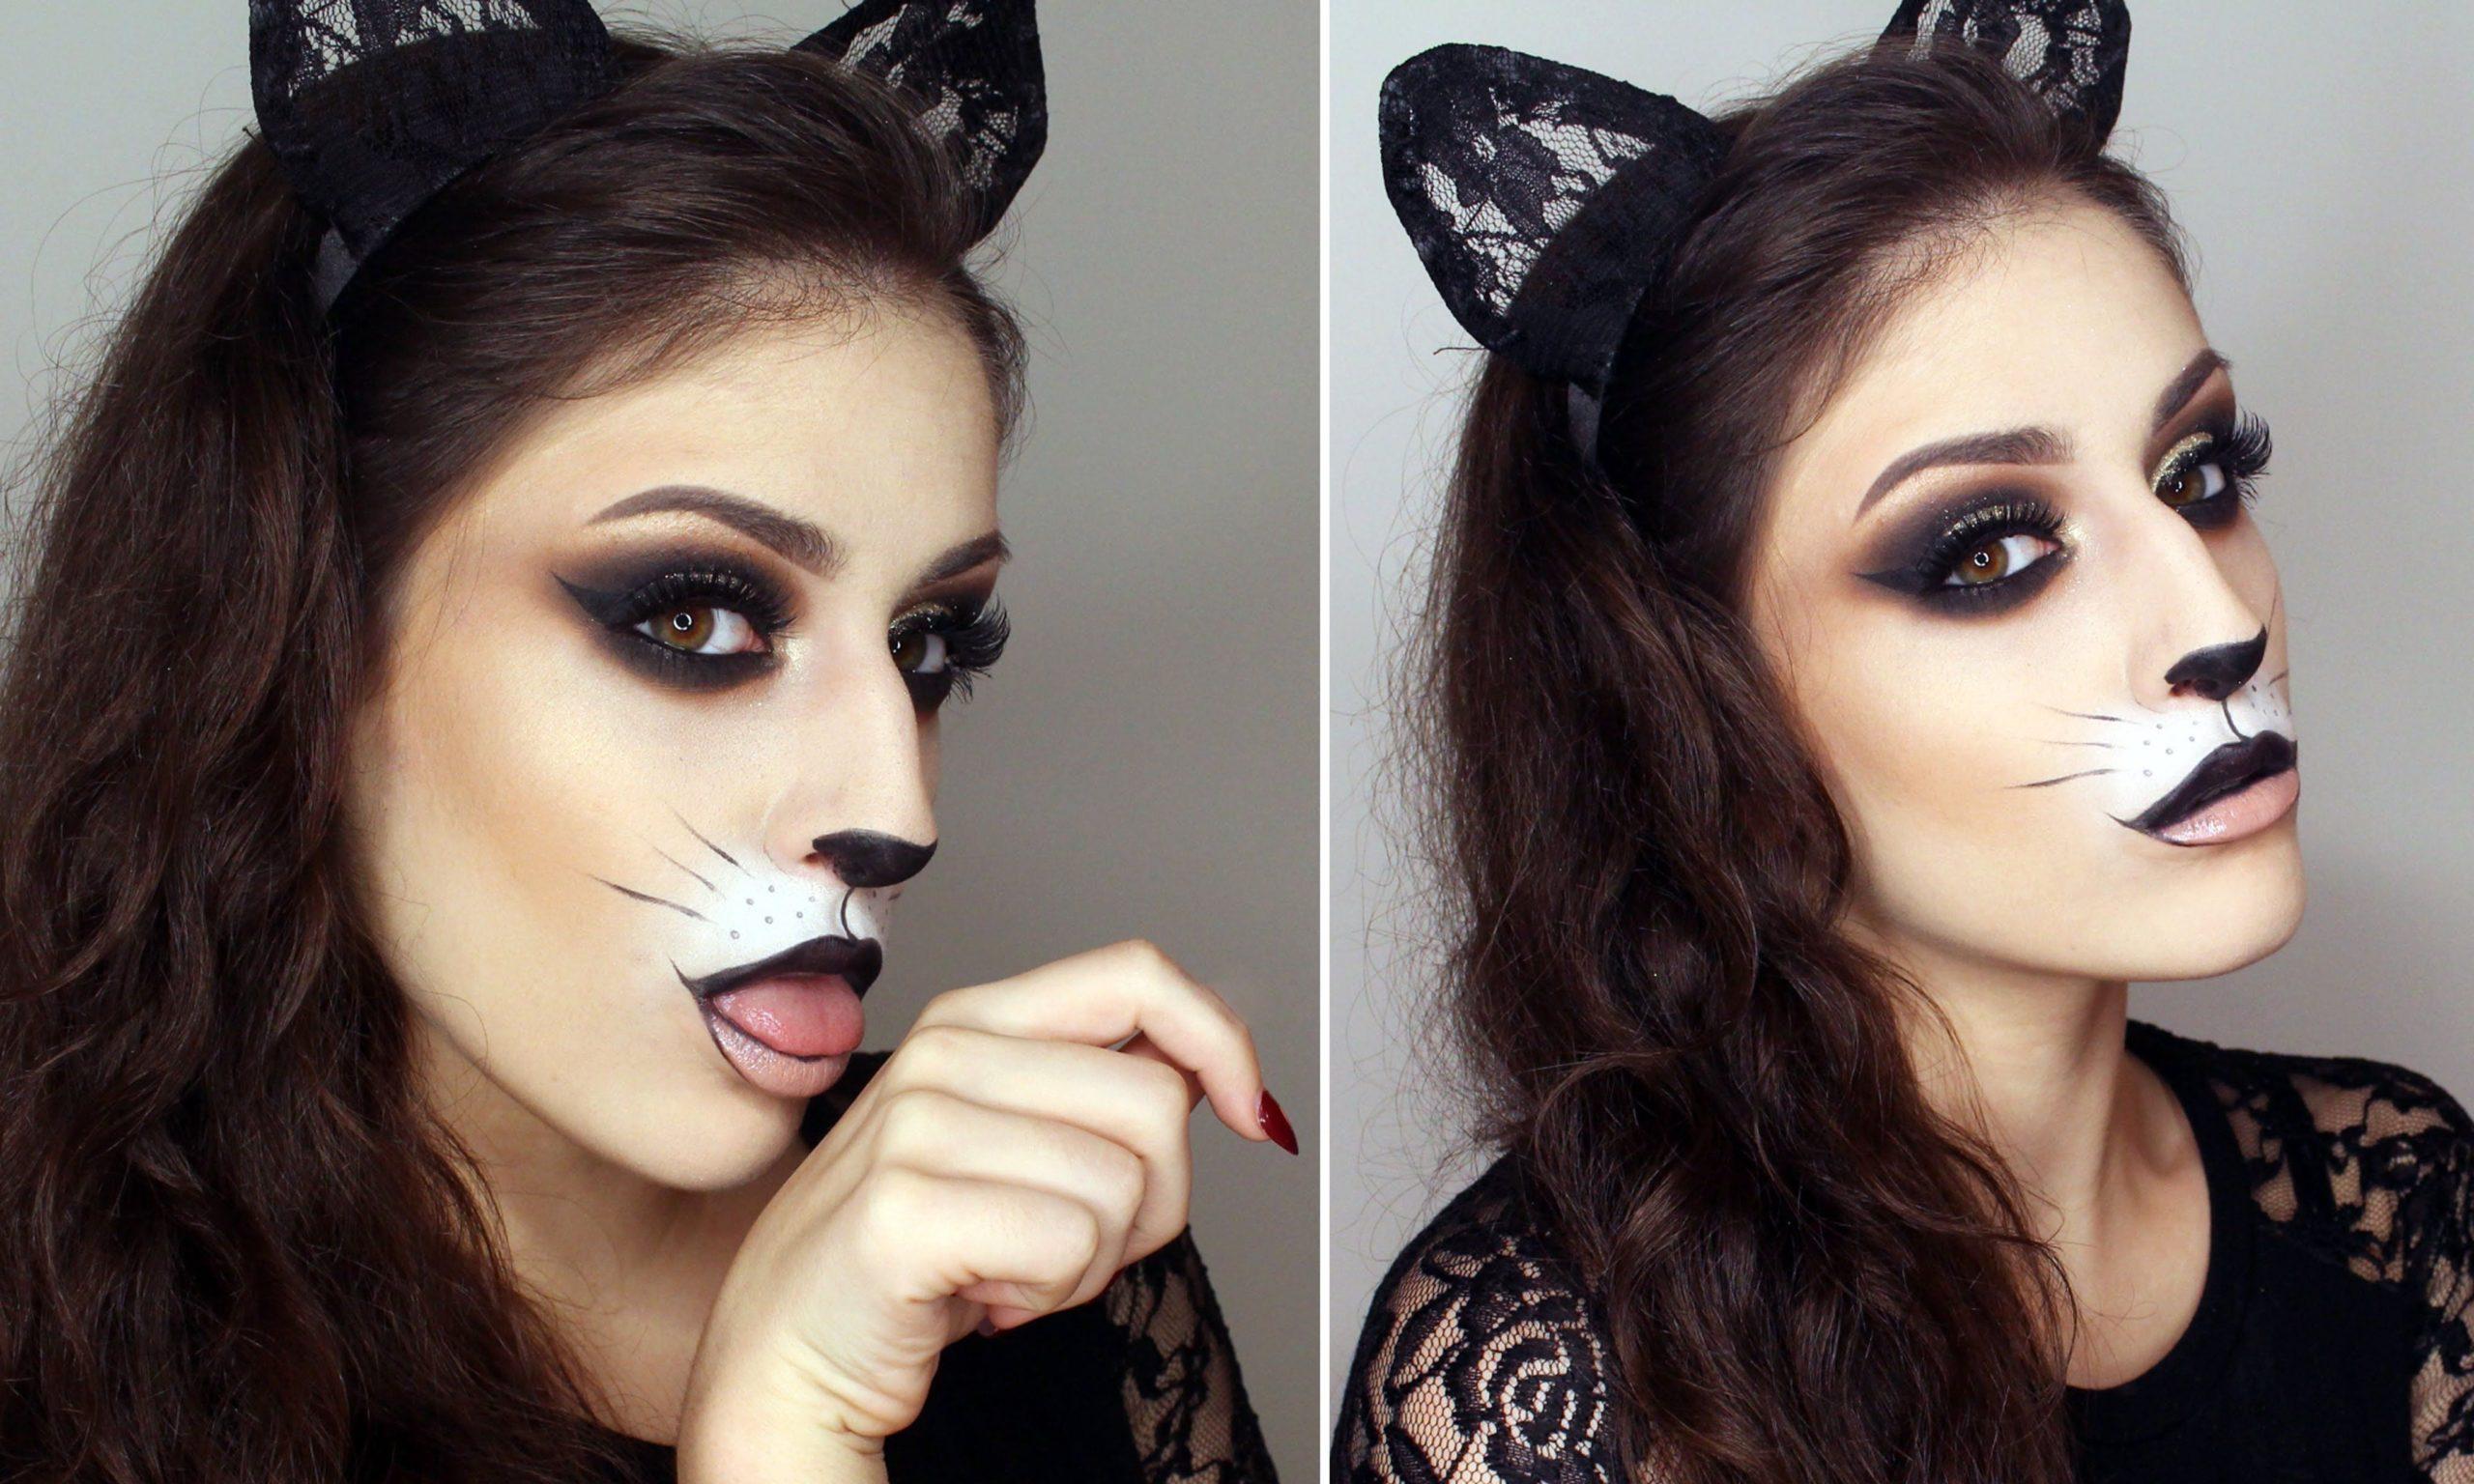 Déguisement félin pour Halloween.